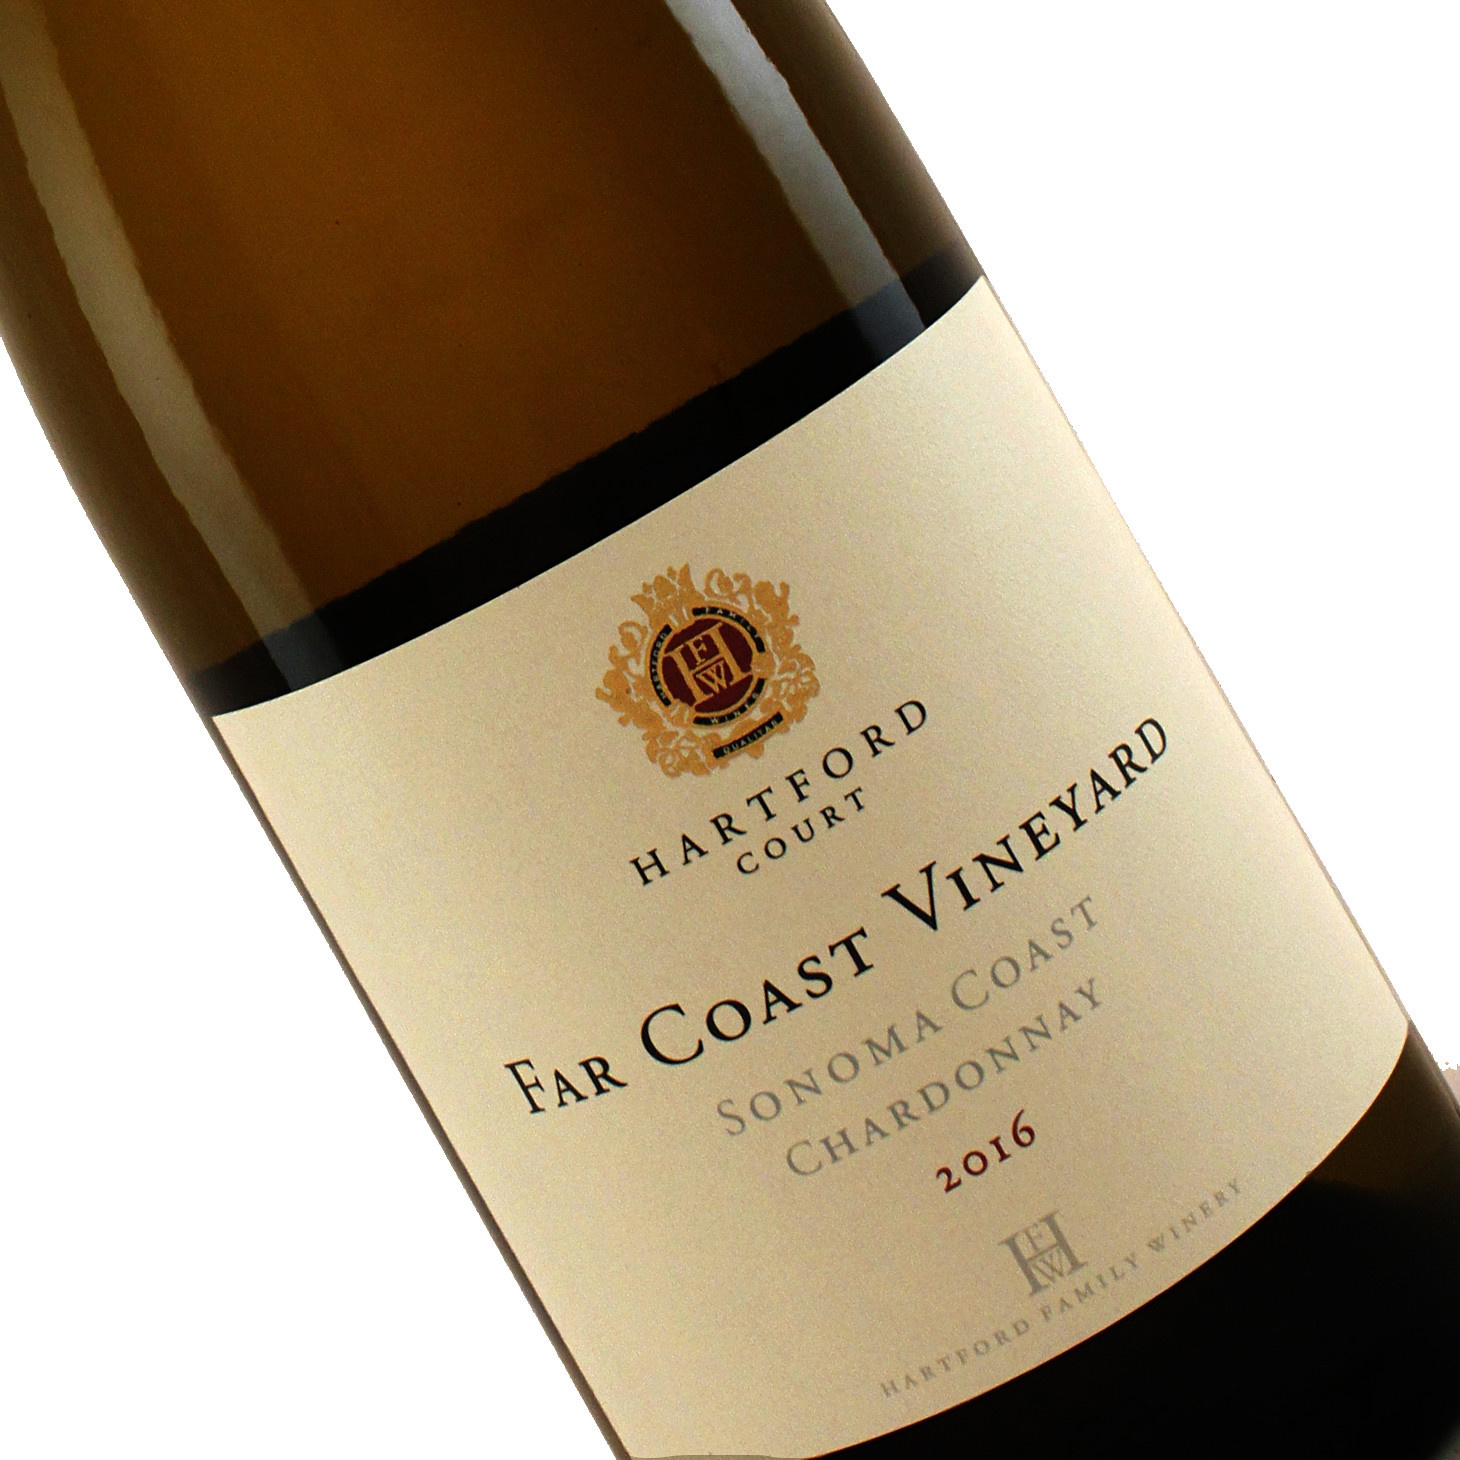 Hartford Court 2016 Chardonnay Far Coast Vineyard, Sonoma Coast